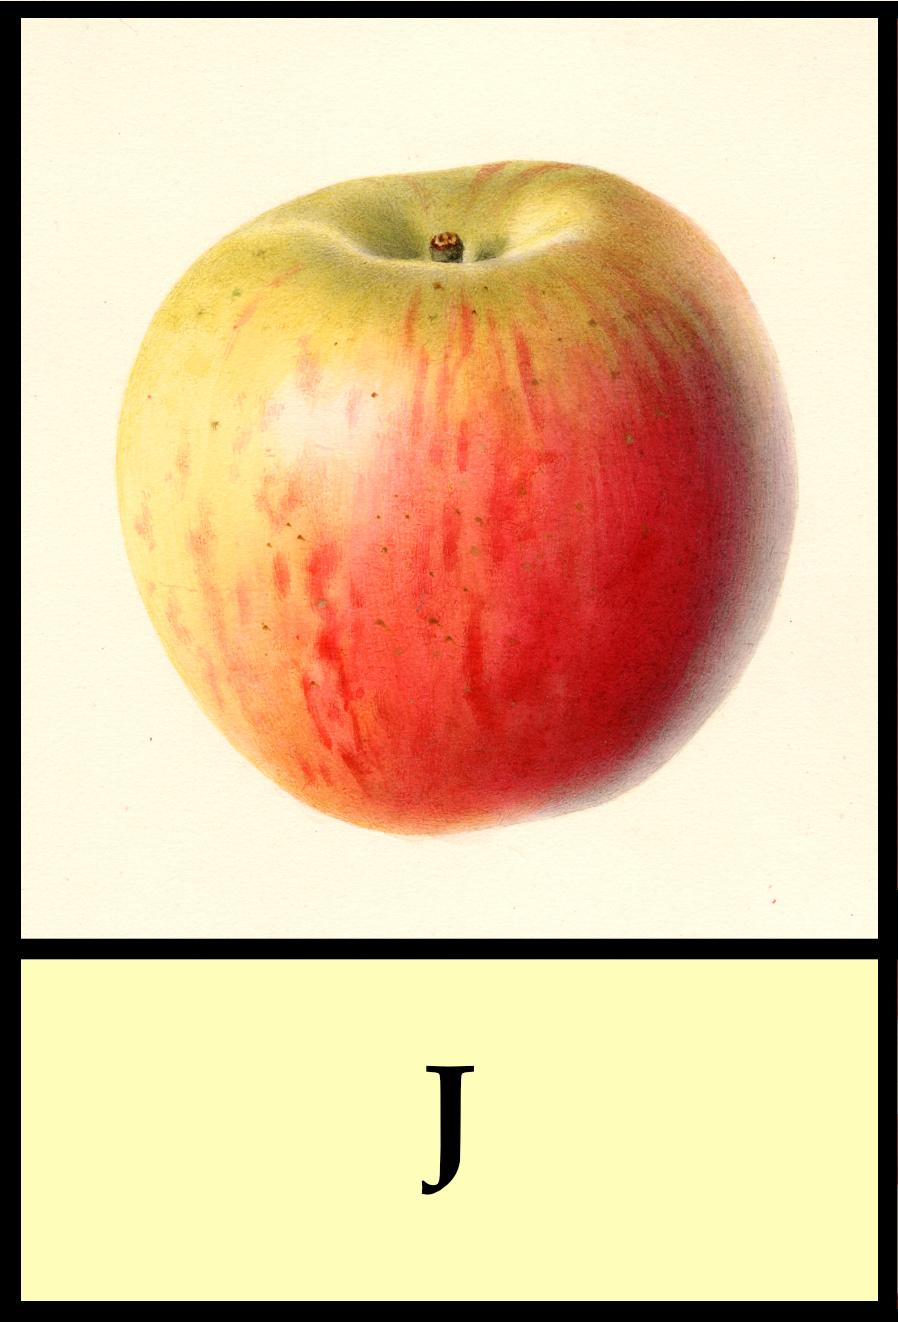 J apples